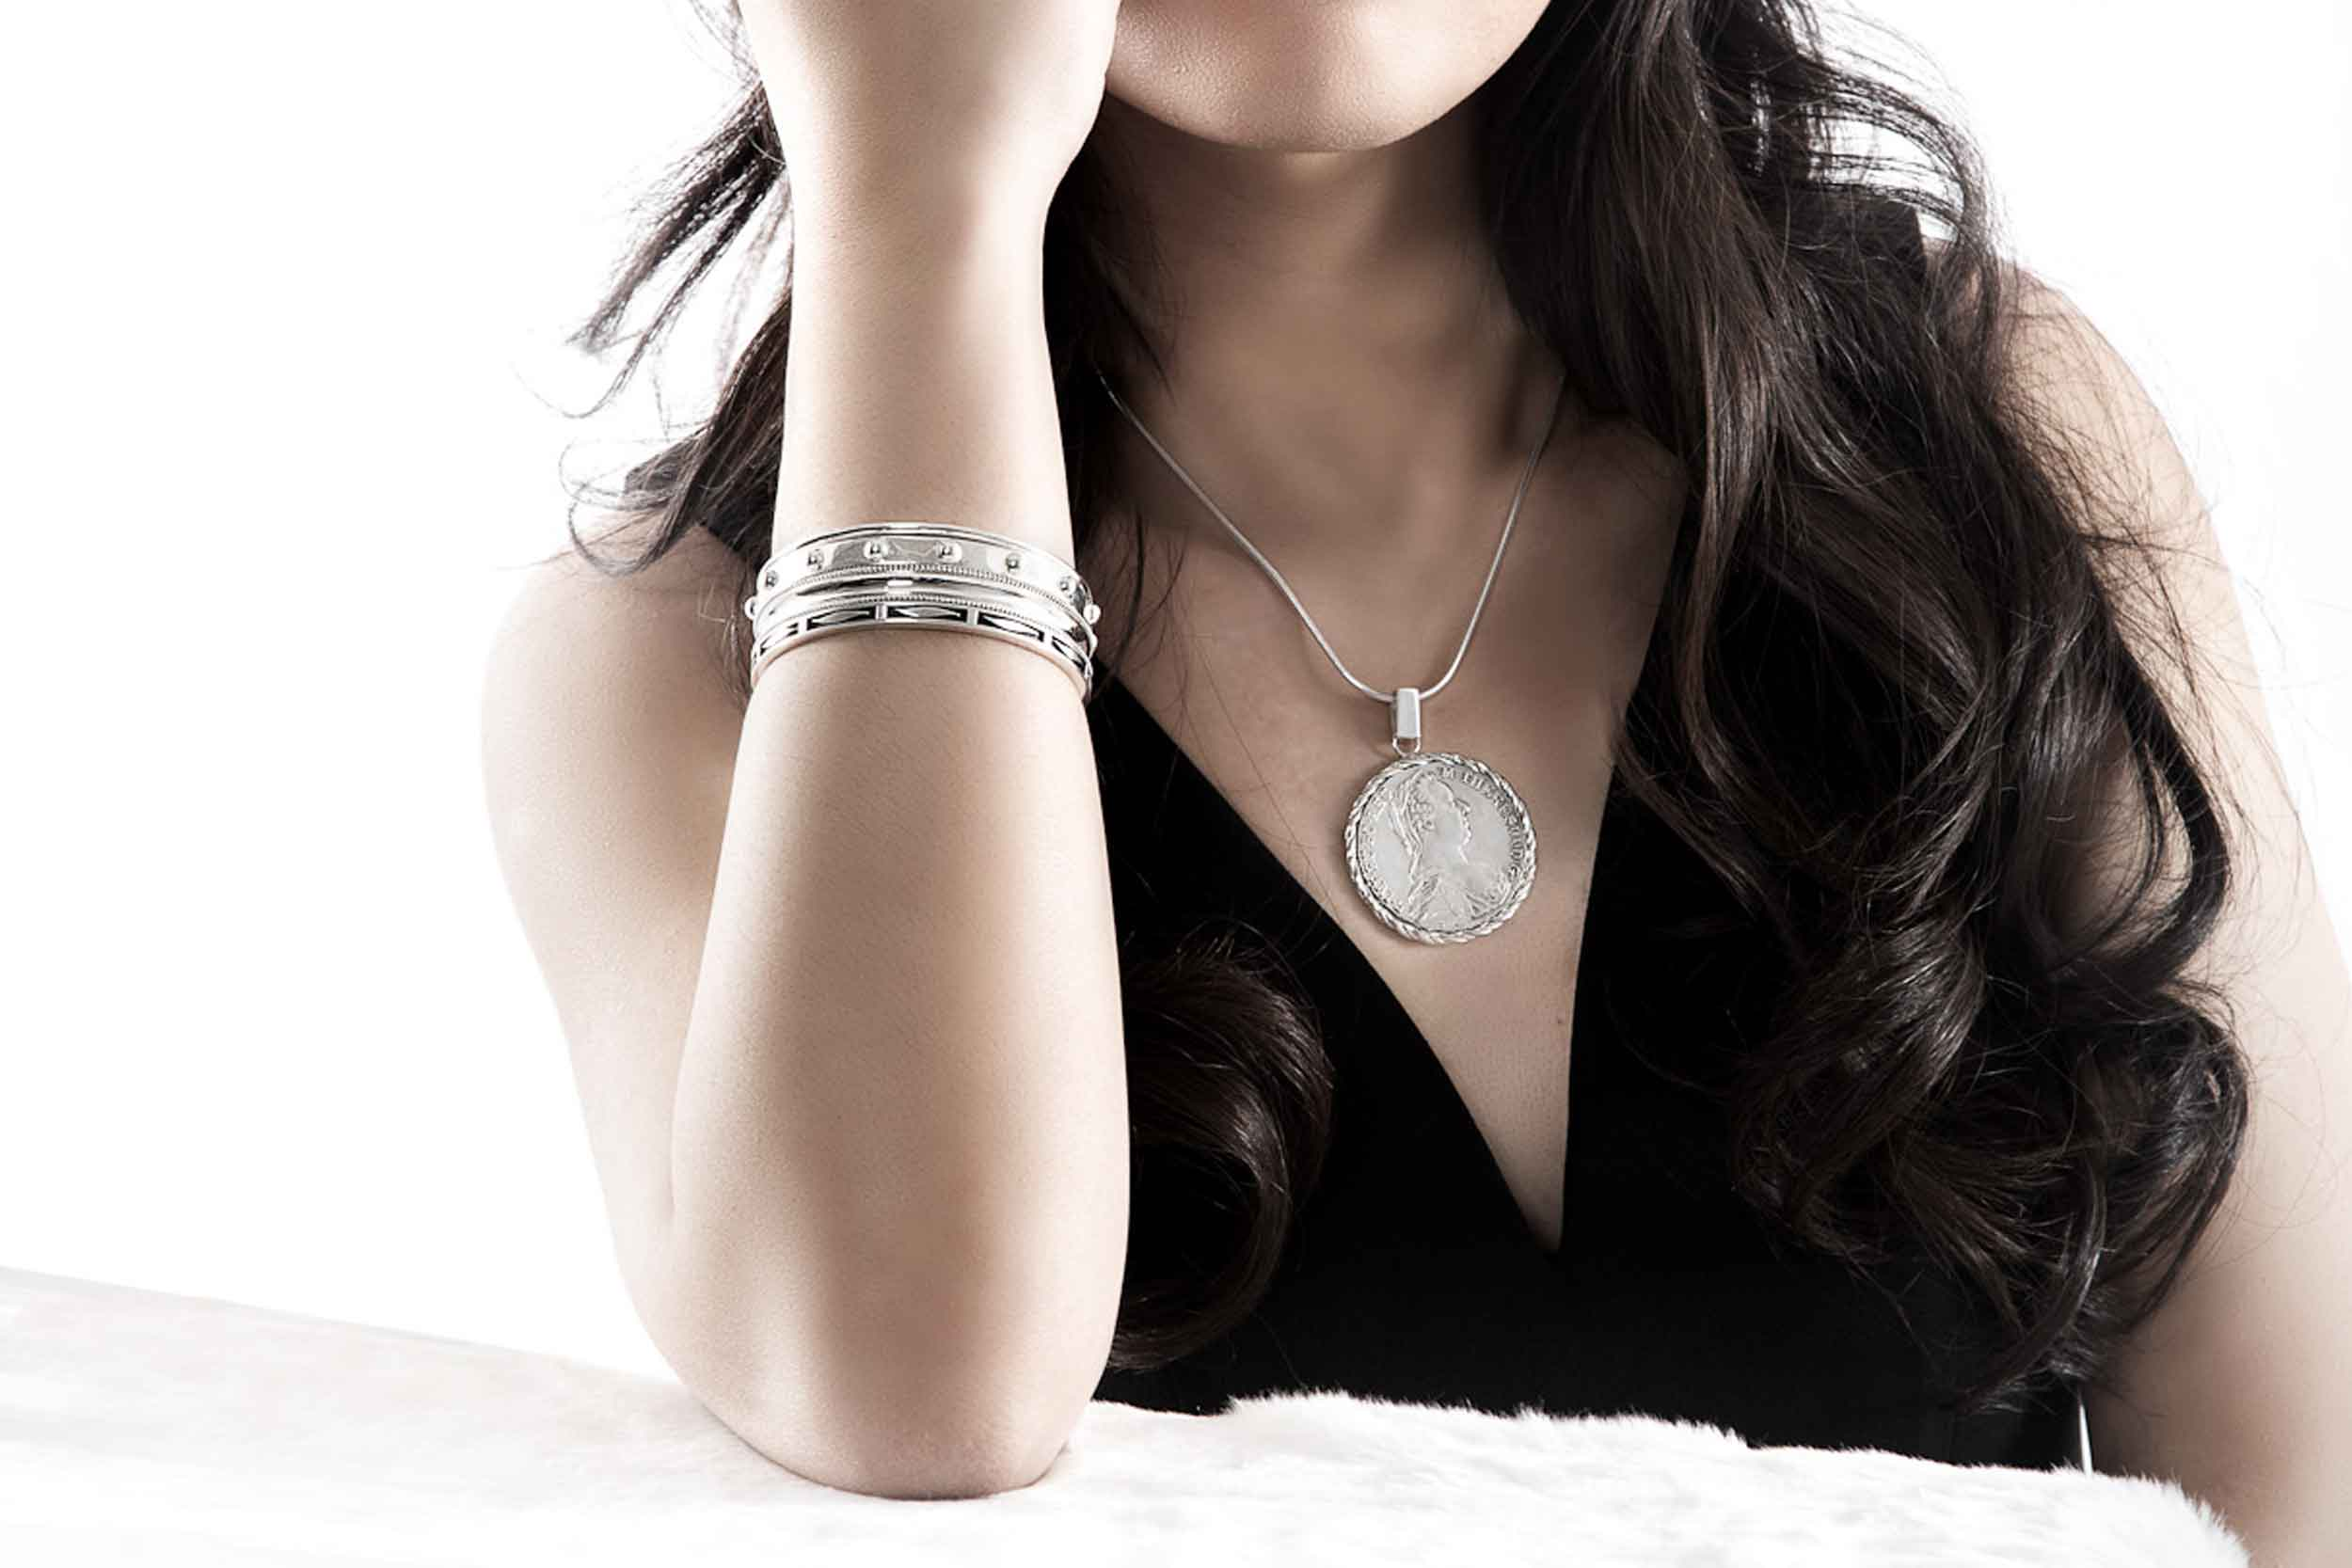 Model showing Thomas Pinck bangles and the Maria Theresa braided silver dollar pendant.